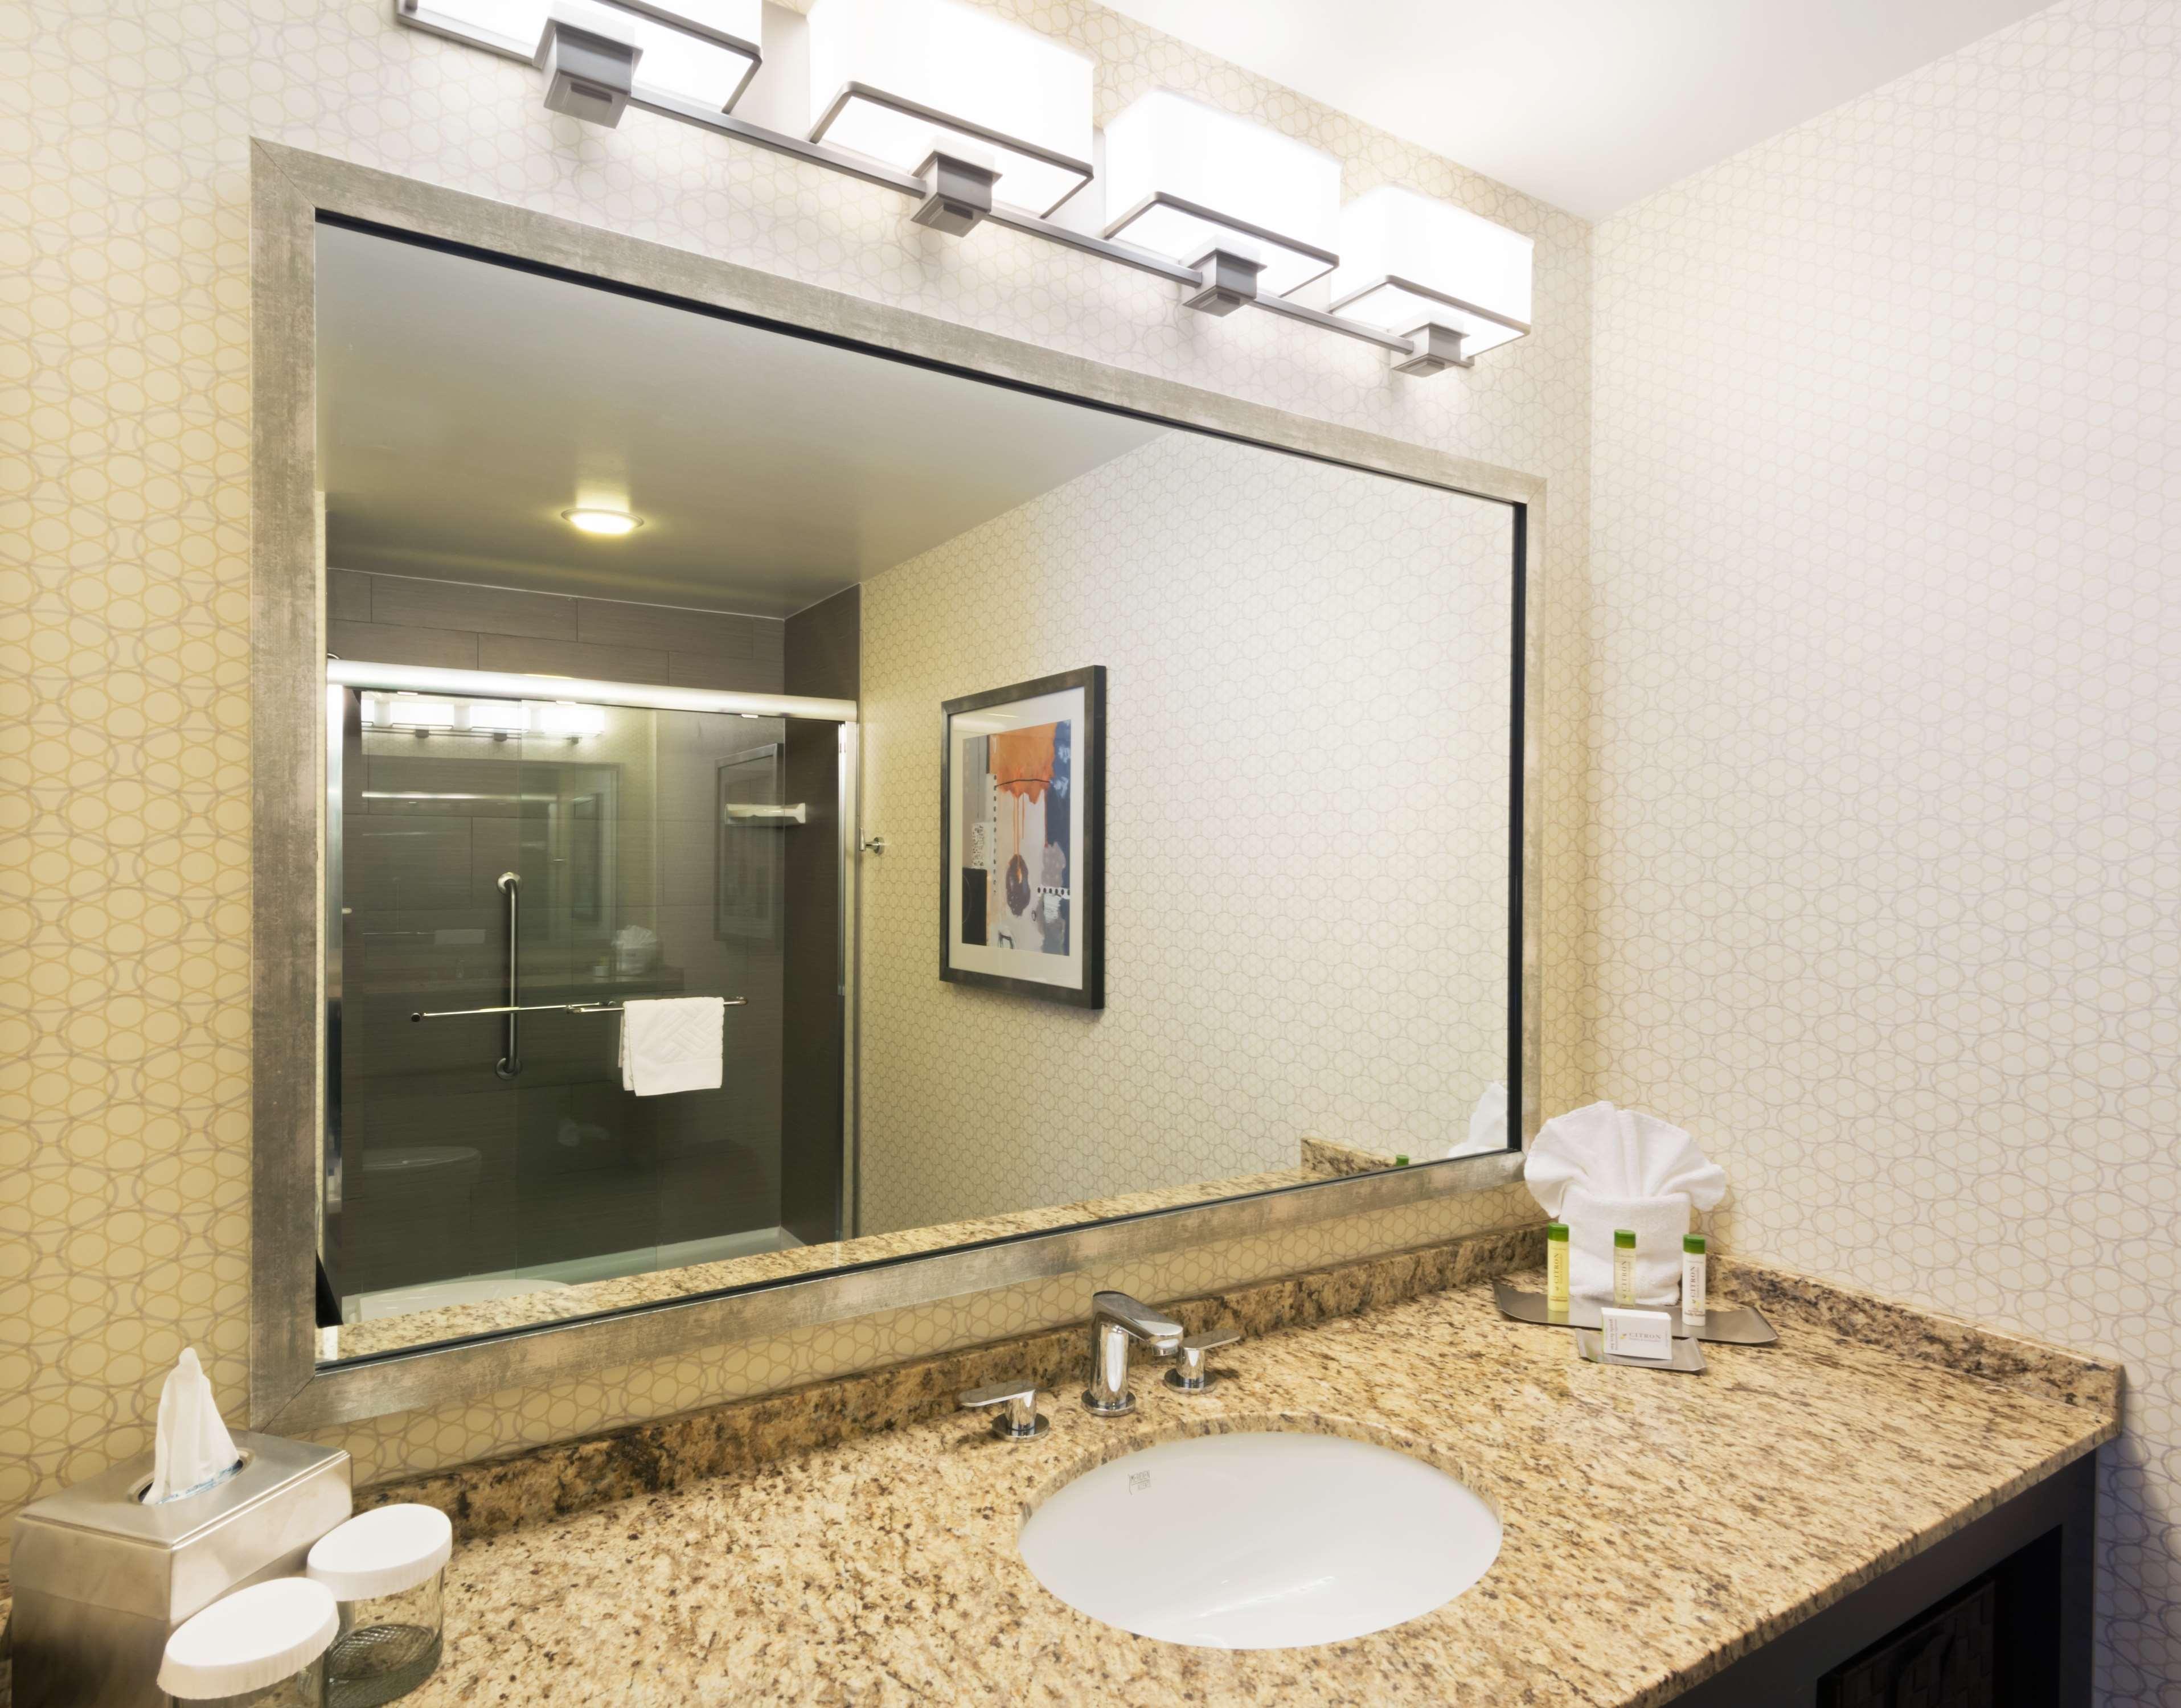 DoubleTree Suites by Hilton Hotel Austin image 3